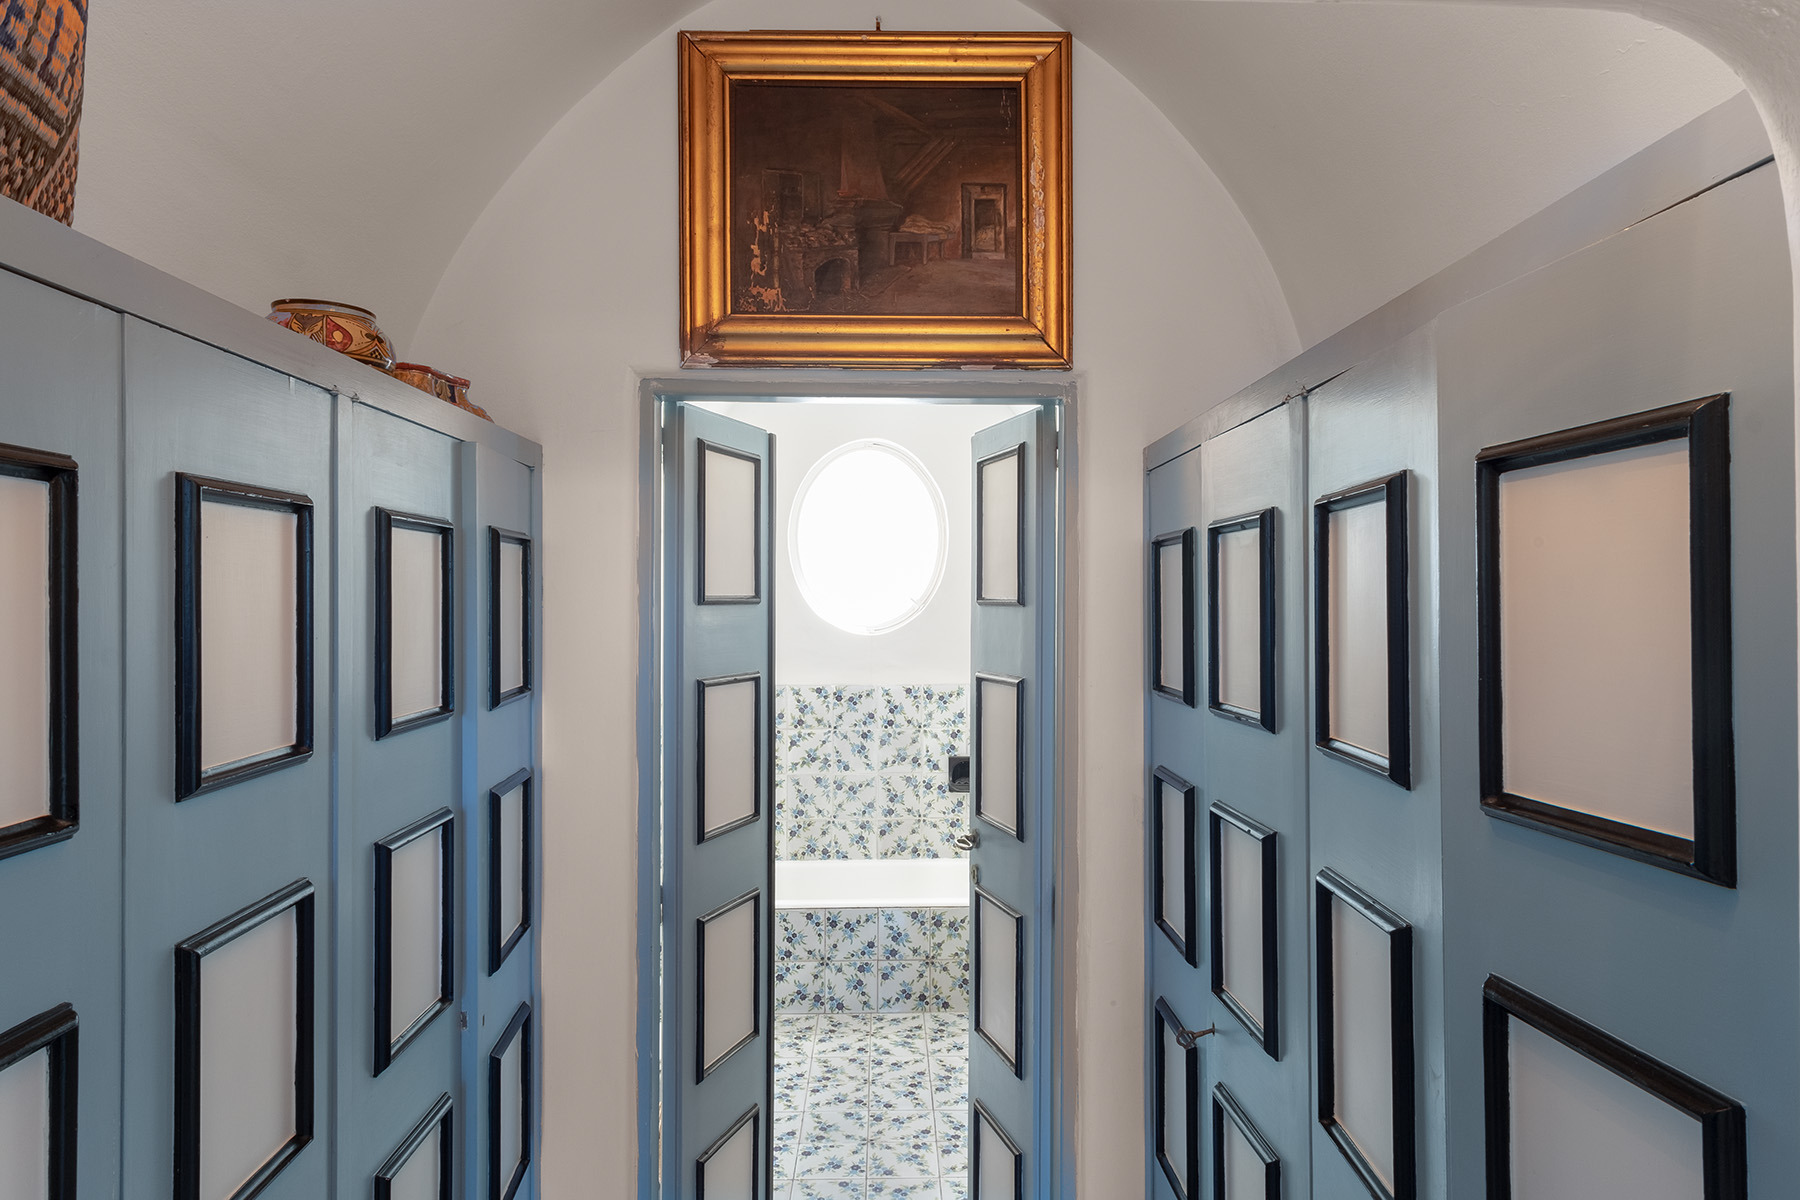 Casa indipendente in Vendita a Capri: 5 locali, 300 mq - Foto 25